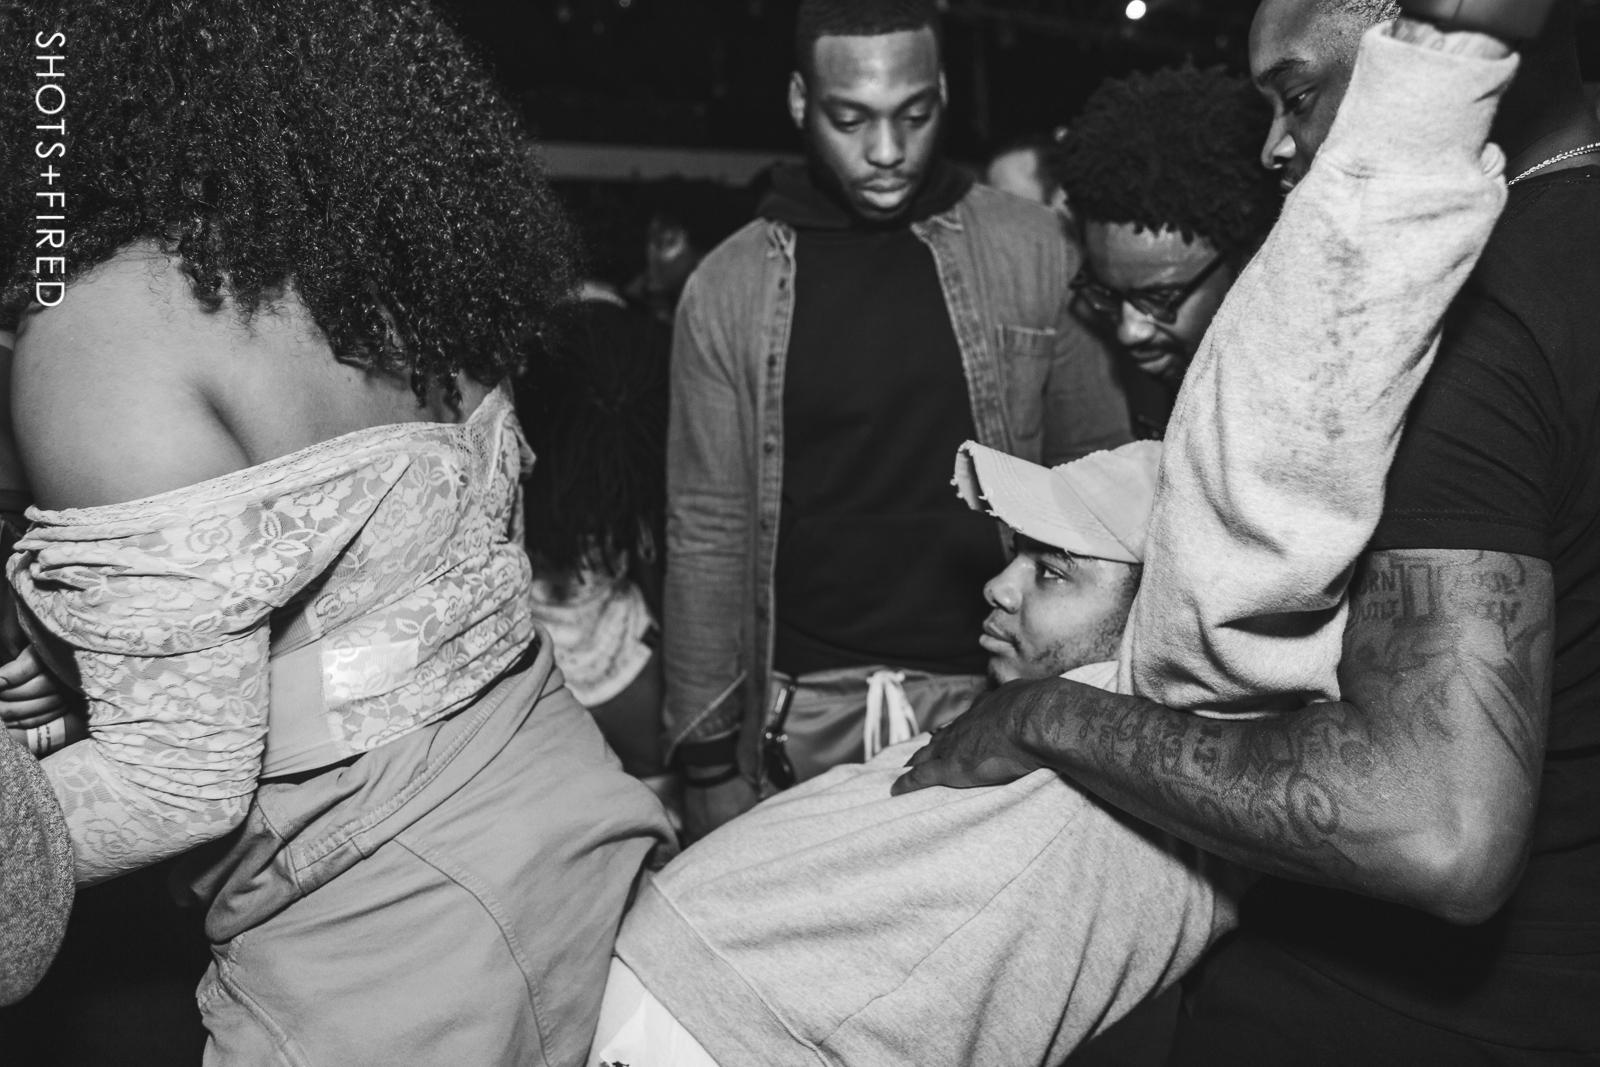 FRIENDS & FAM (PHL) 5 YR ANNIVERSARY W/ MATTHEW LAW Feat. DJ DIAMOND KUTS @ WAREHOUSE ON WATTS (December 2018) // Presented By Matthew Law